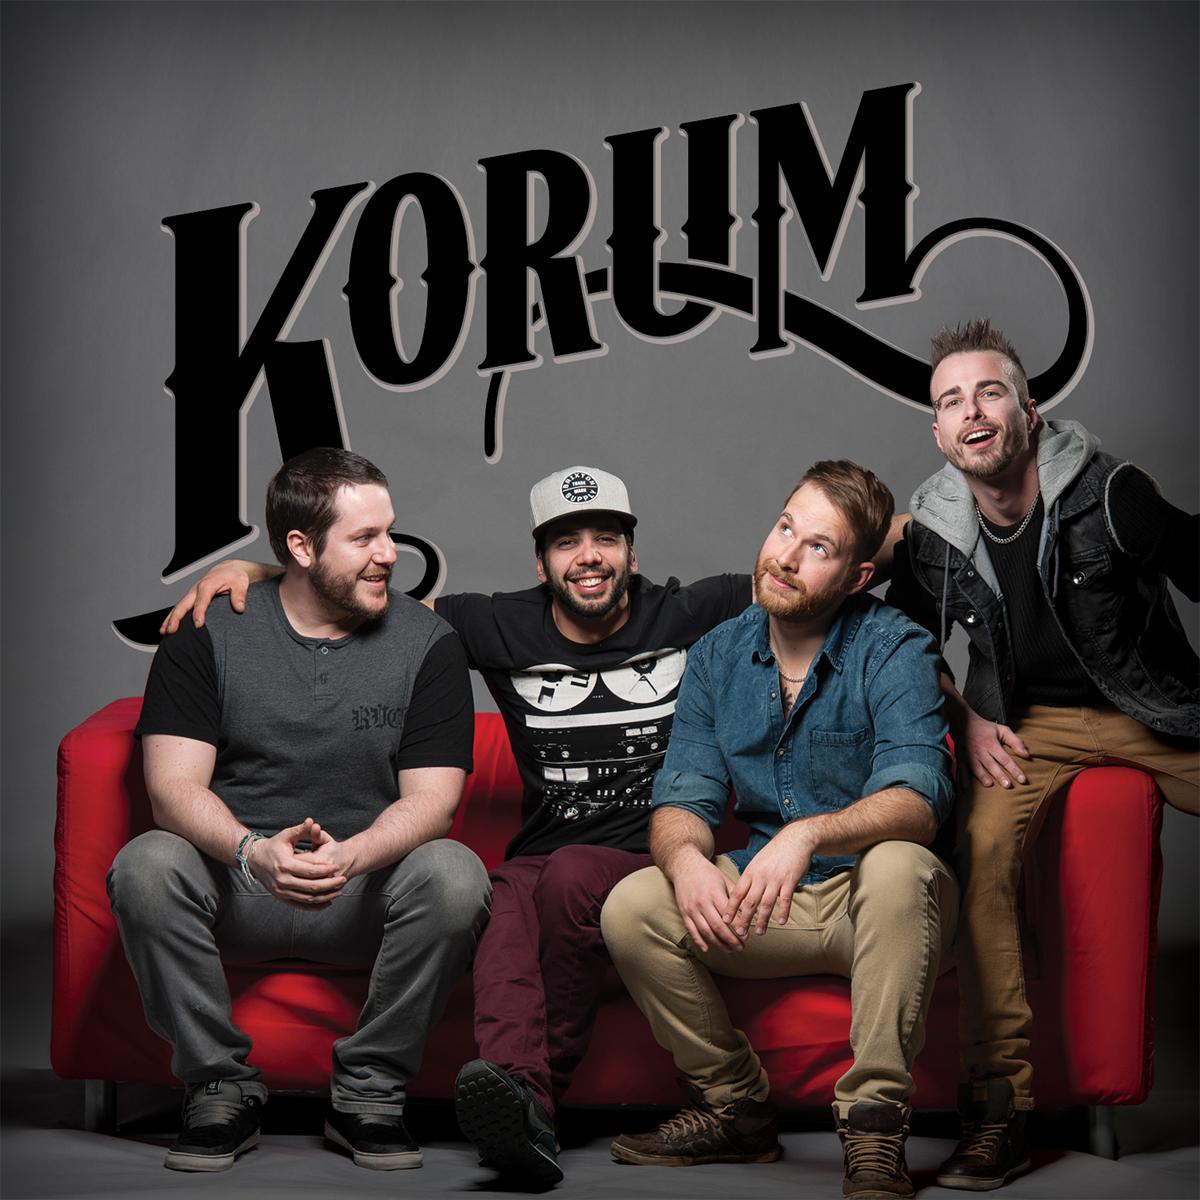 Album Korum demo ep